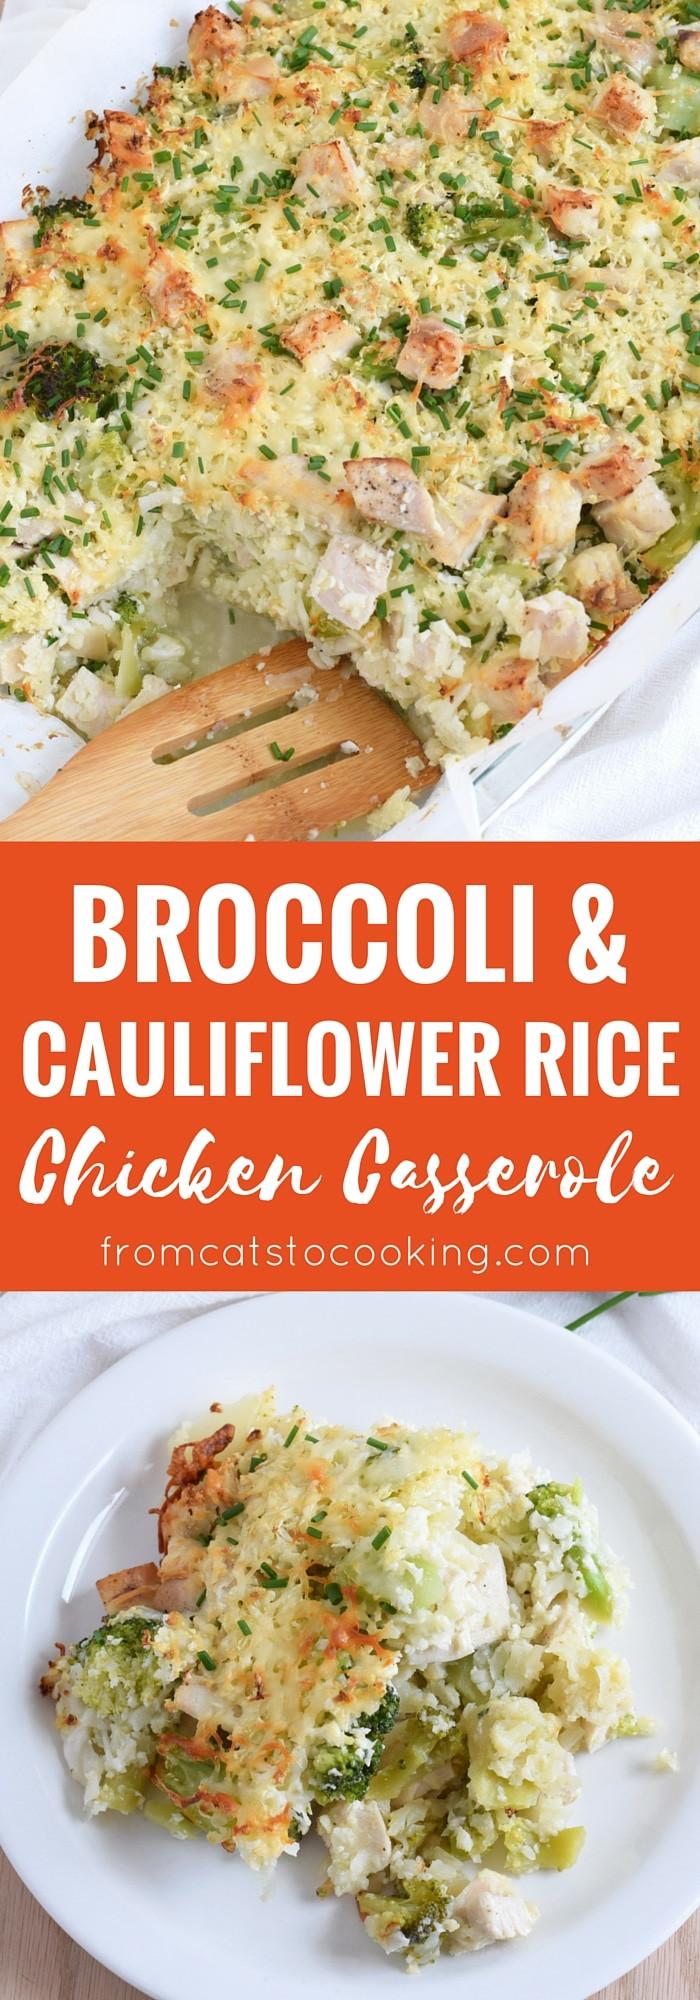 Gluten Free Broccoli Rice Casserole  gluten free broccoli rice casserole